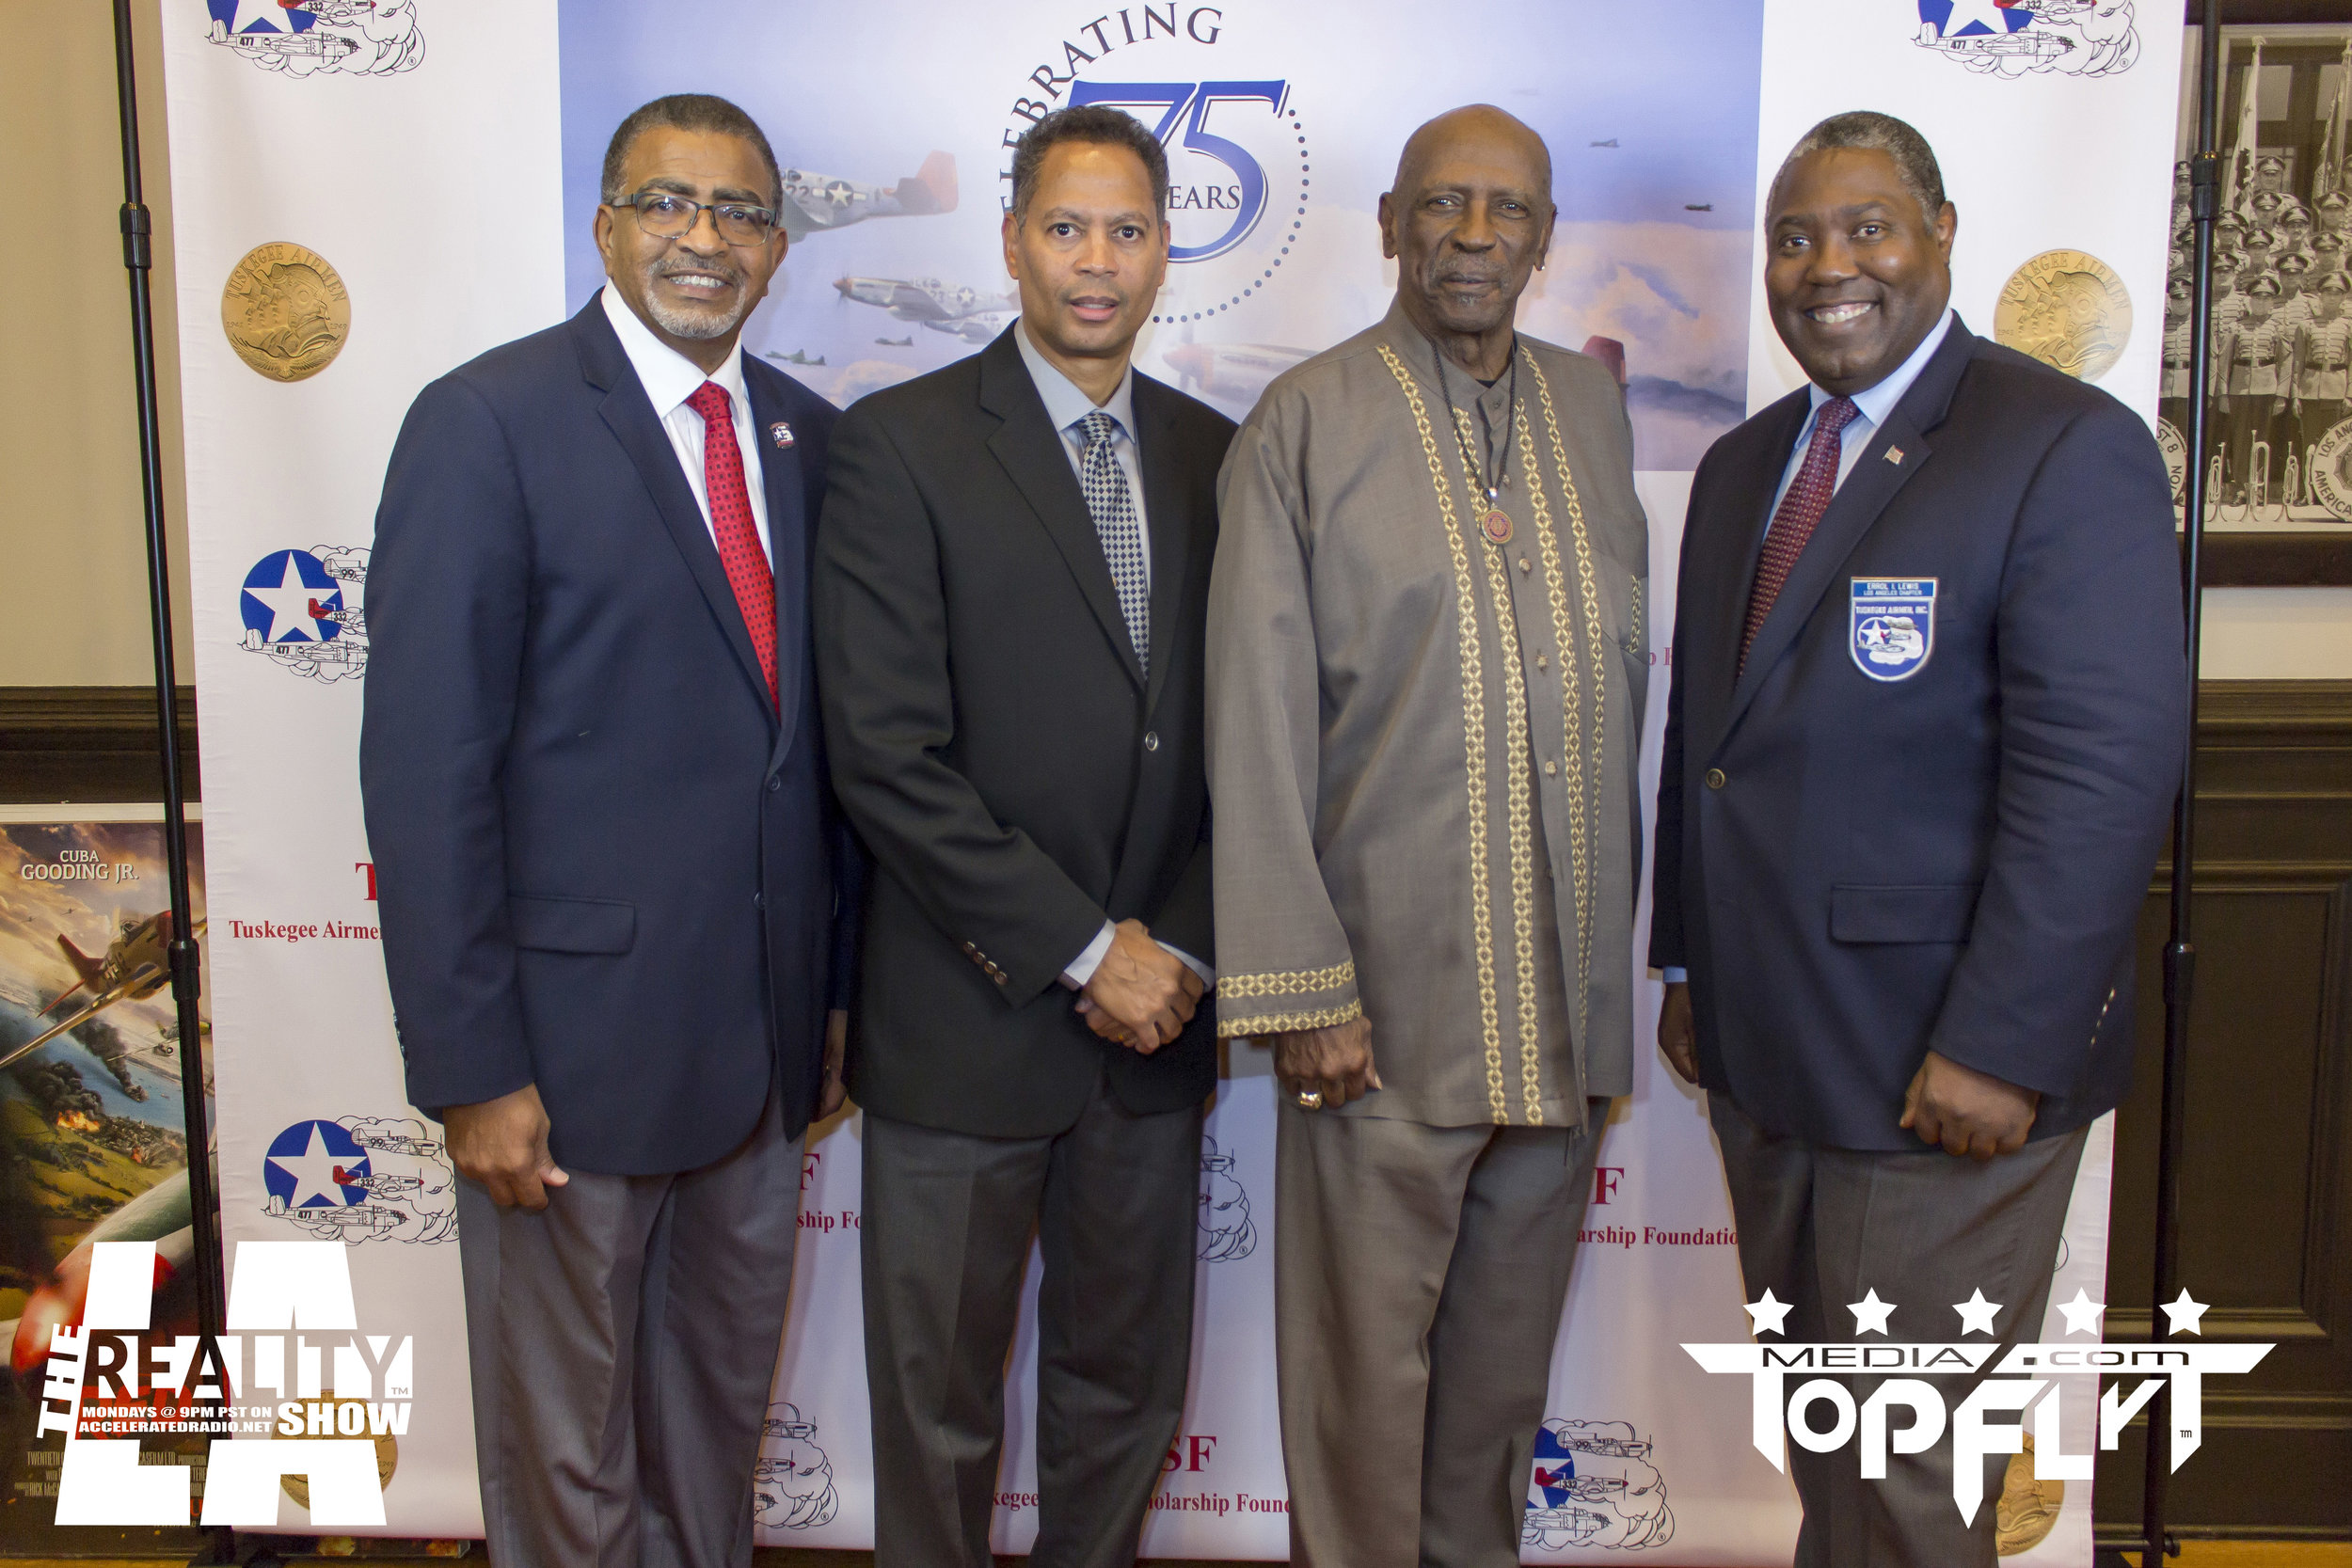 The Reality Show LA - Tuskegee Airmen 75th Anniversary VIP Reception_68.jpg